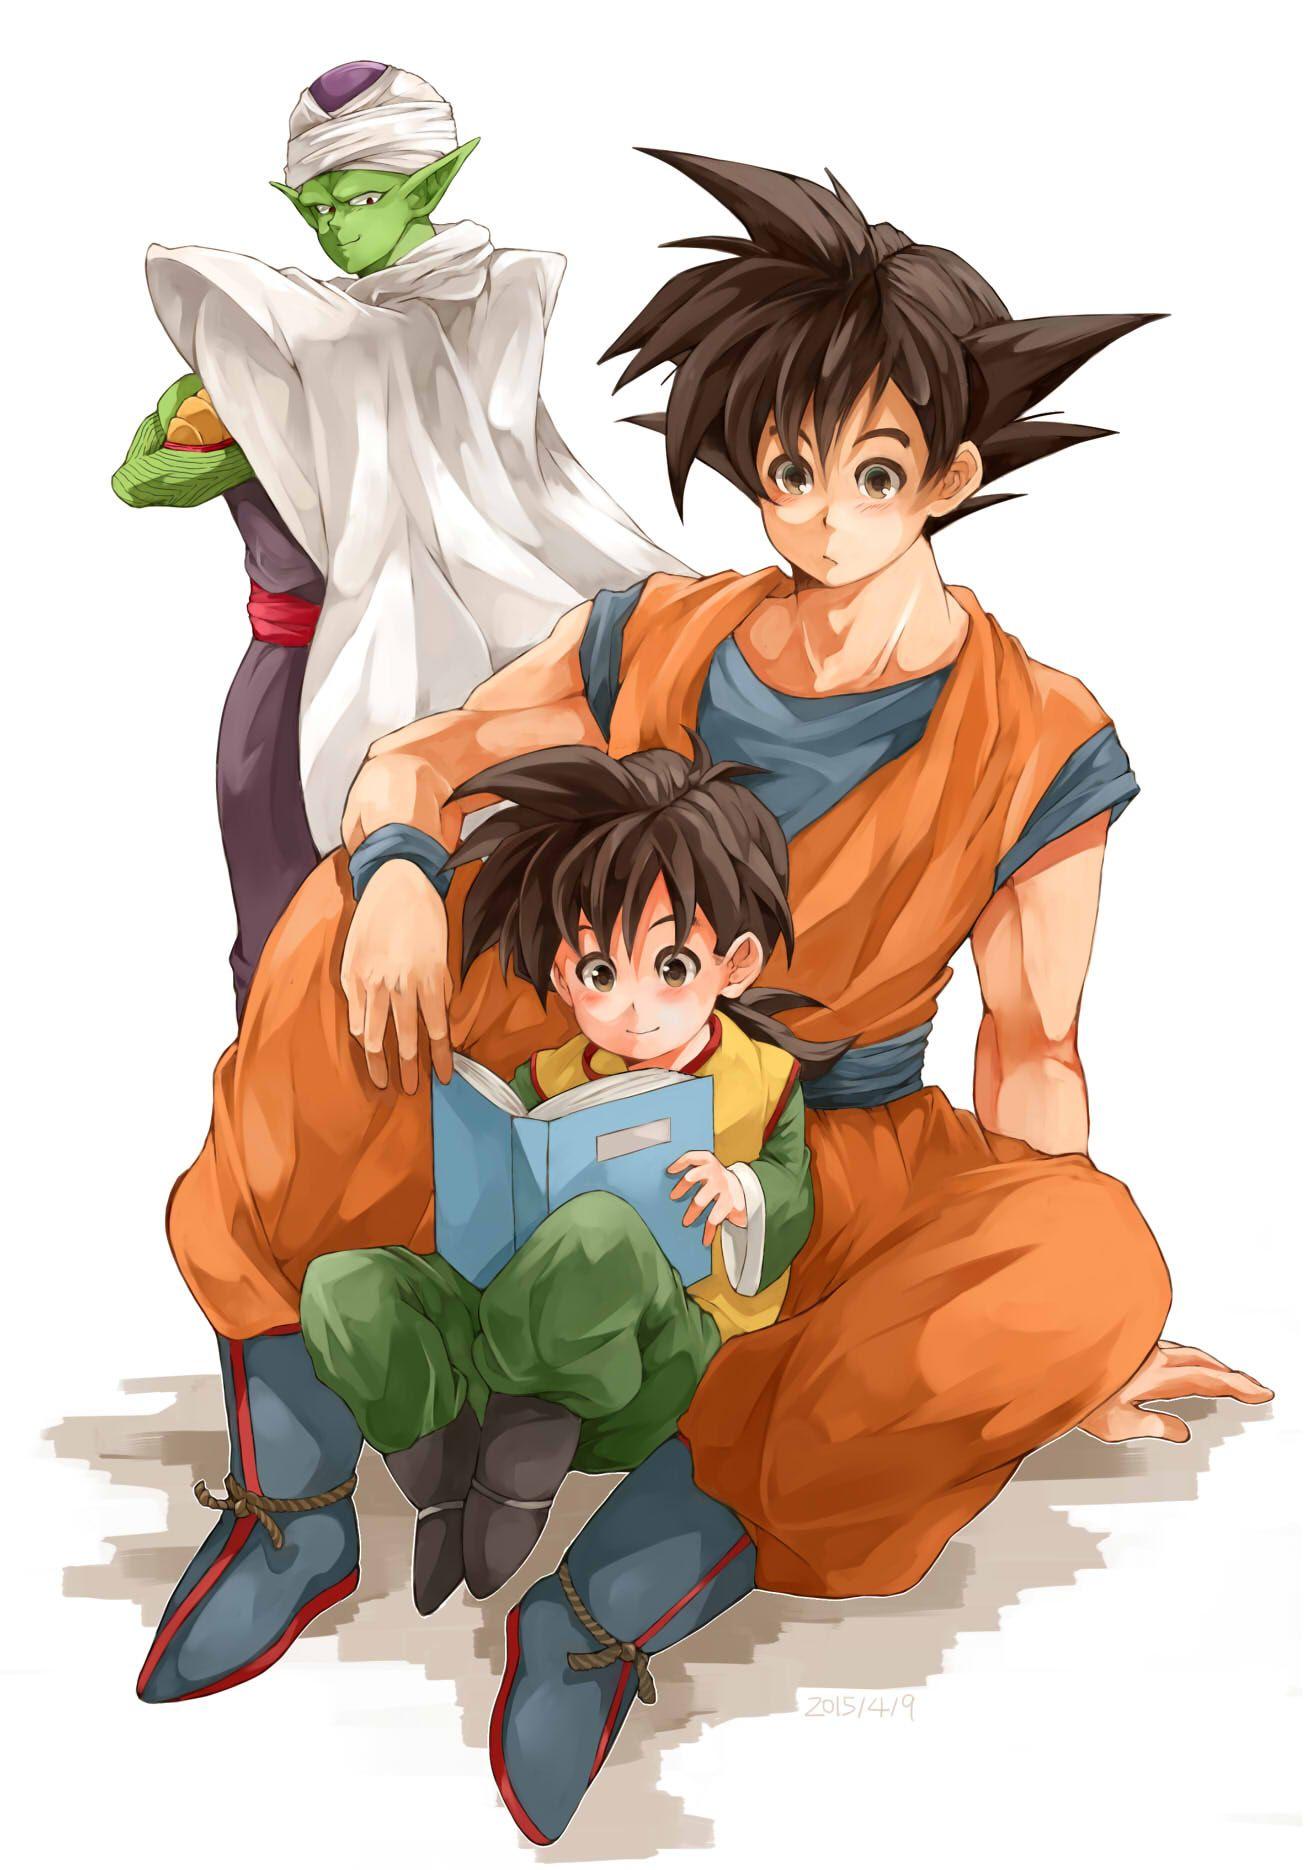 Piccolo Goku Gohan Dragon Ball Art Dragon Ball Super Dragon Ball Z